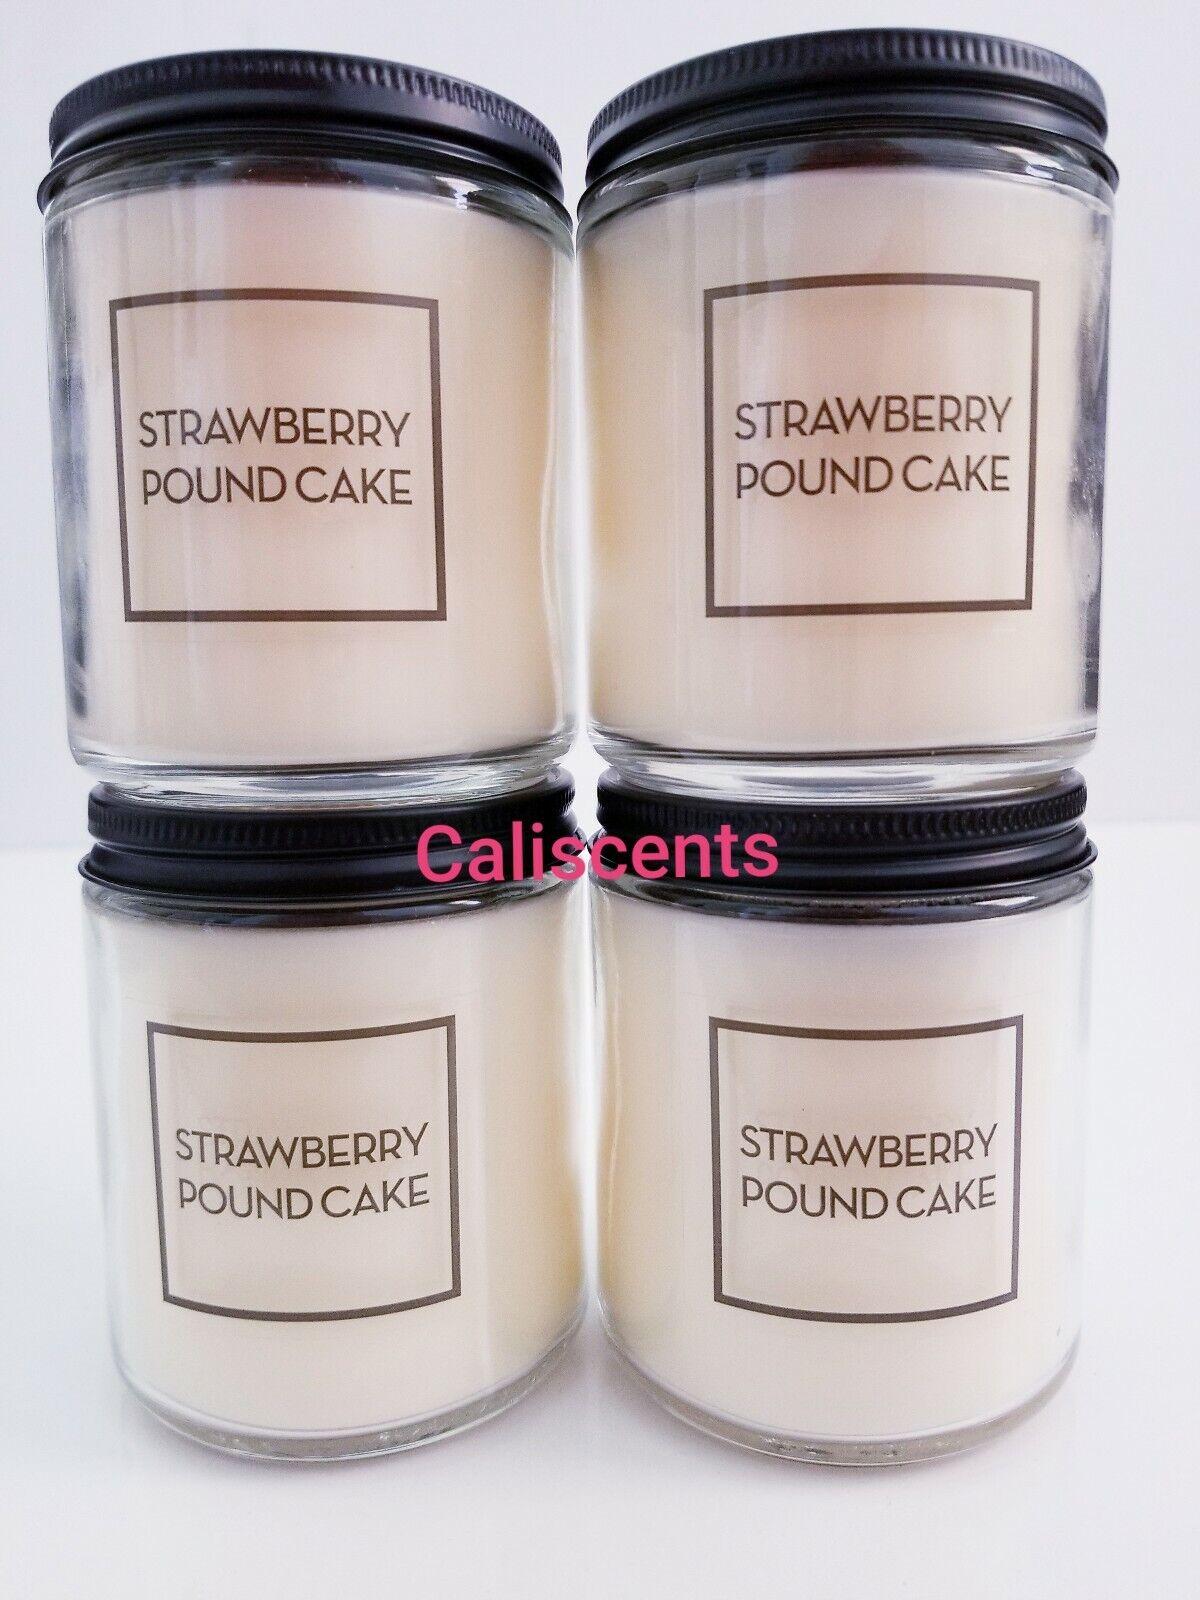 Bath & Body Works STRAWBERRY POUNDCAKE 7 oz Candles  Burns 20-30 Hrs X4  Ltd Etd